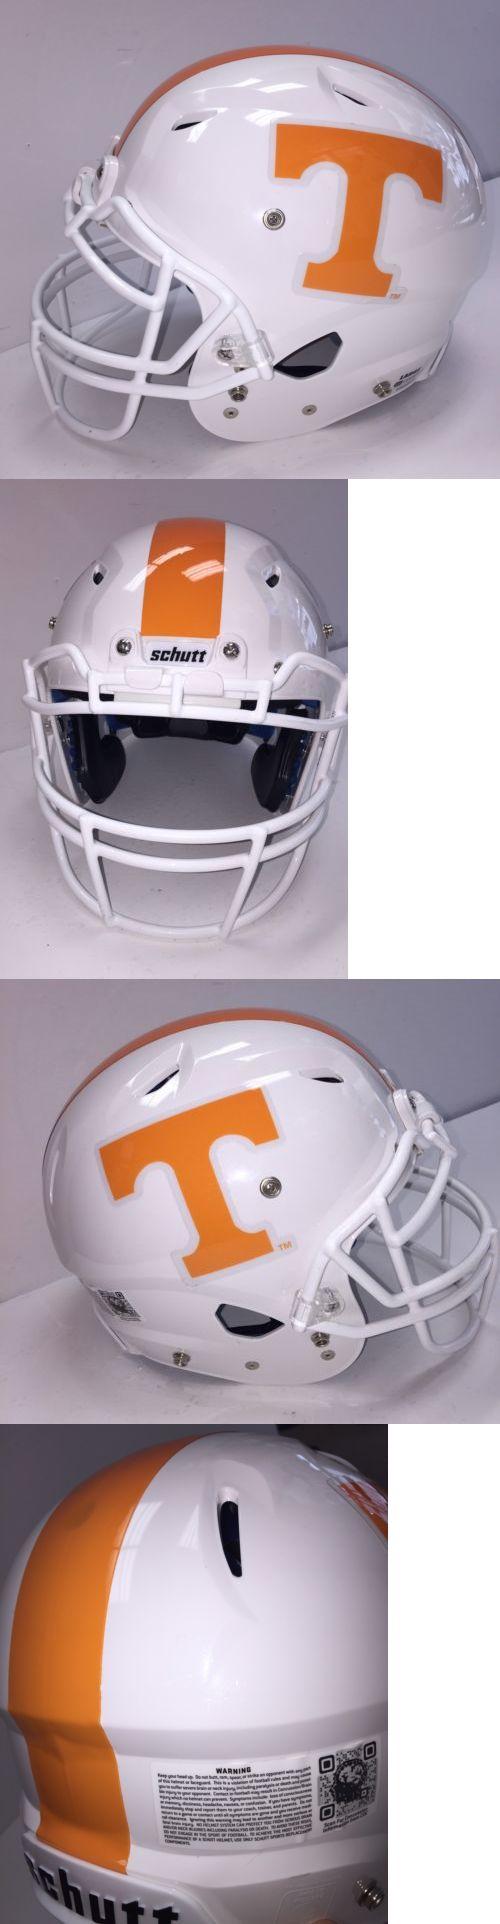 Helmets and Hats 21222: Tennessee Volunteers Football Helmet Schutt Large Vengeance Helmet Pro - New -> BUY IT NOW ONLY: $175 on eBay!